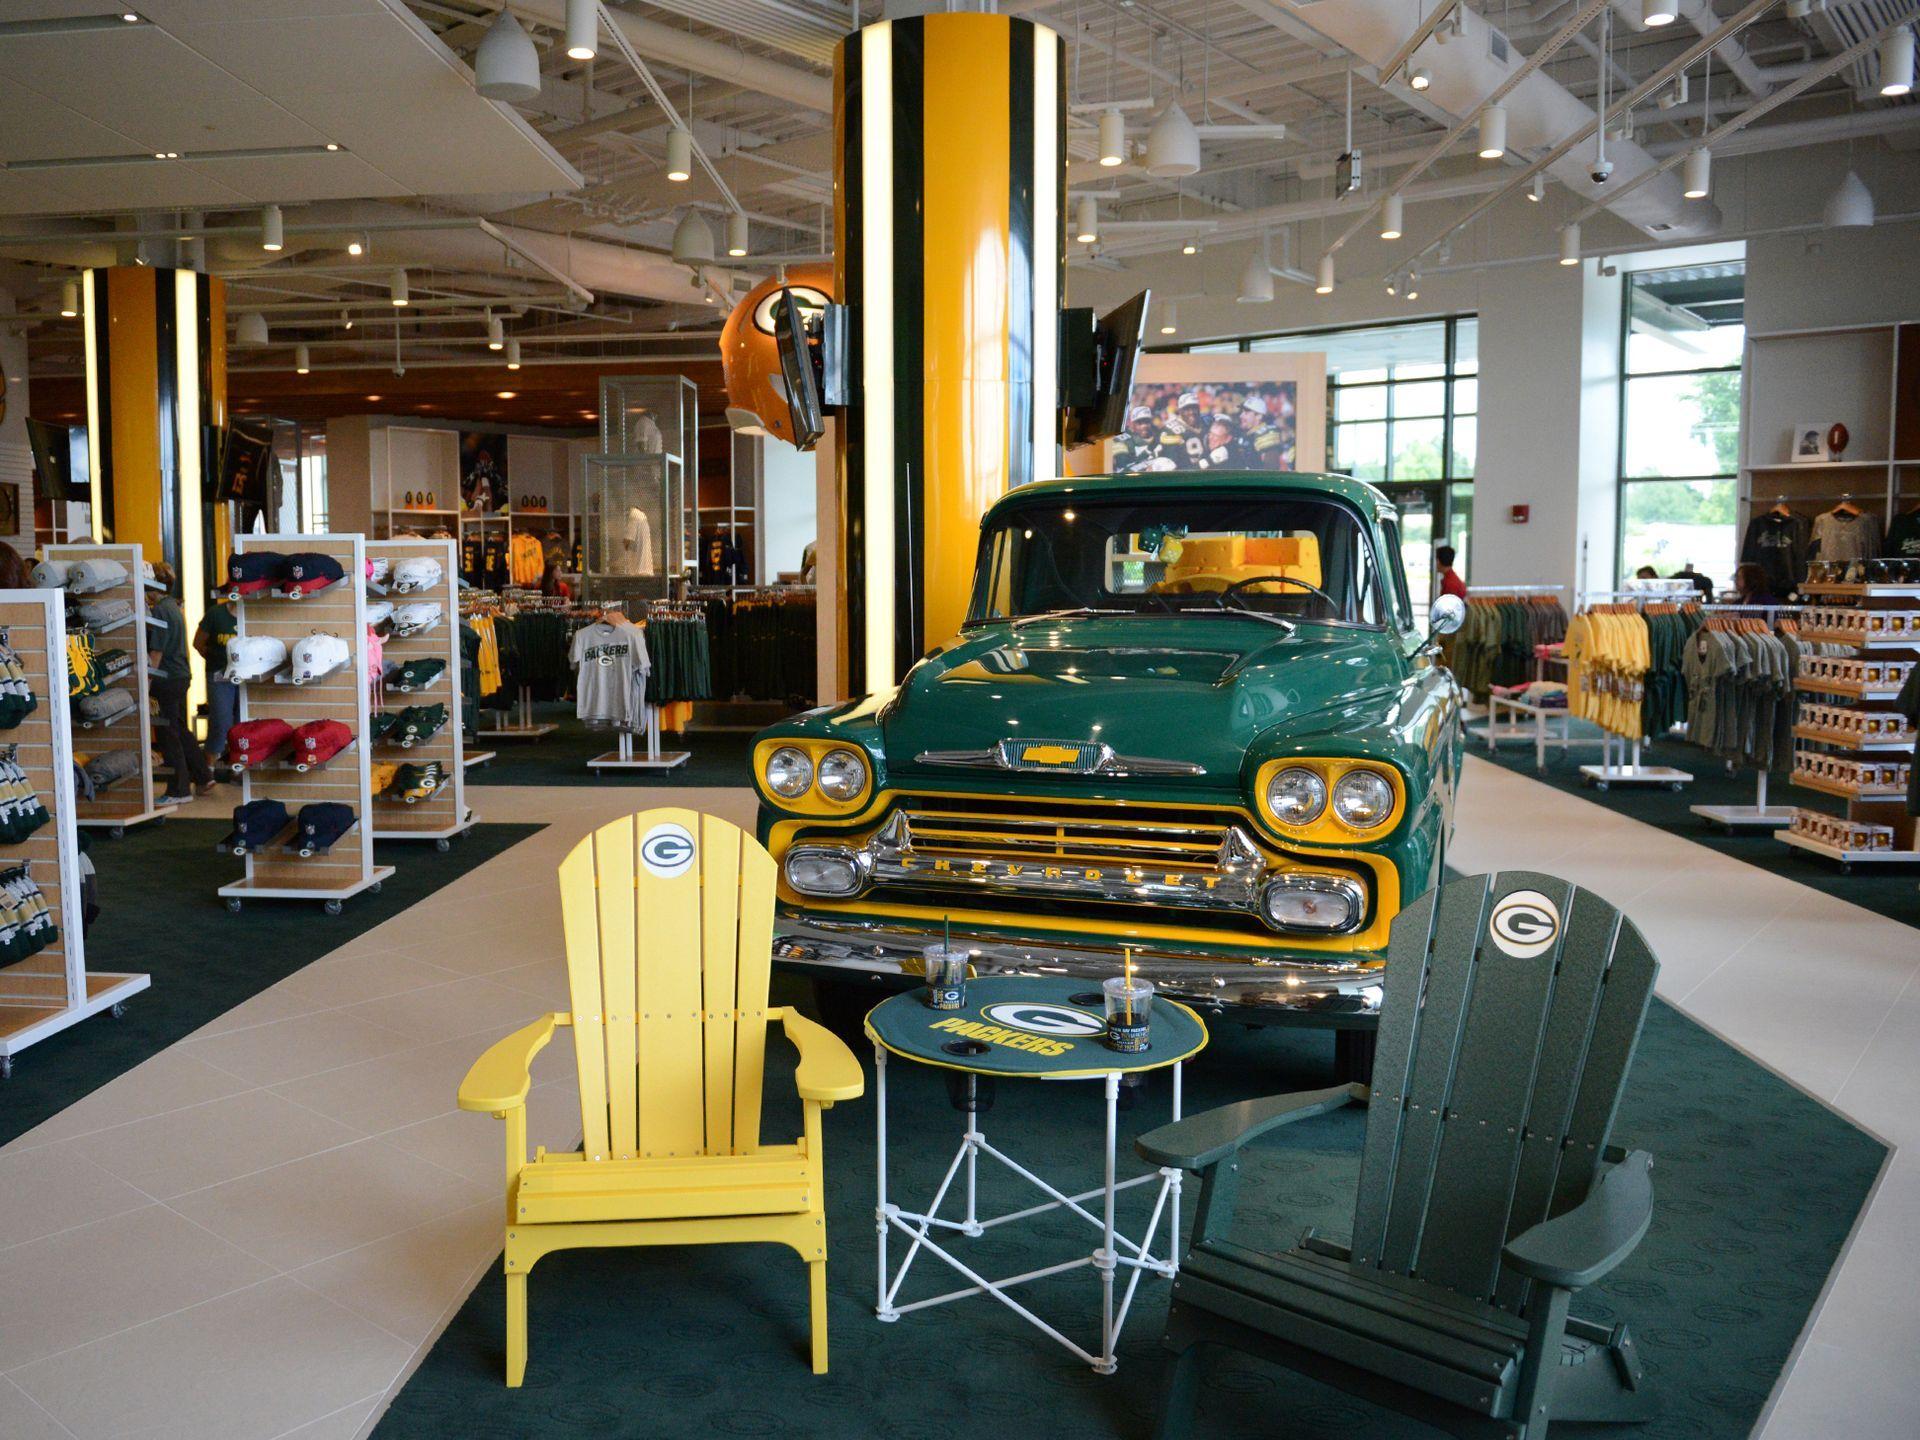 New Packers Pro Shop Opens At Lambeau Field Green Bay Packers Baby Packers Pro Shop Lambeau Field